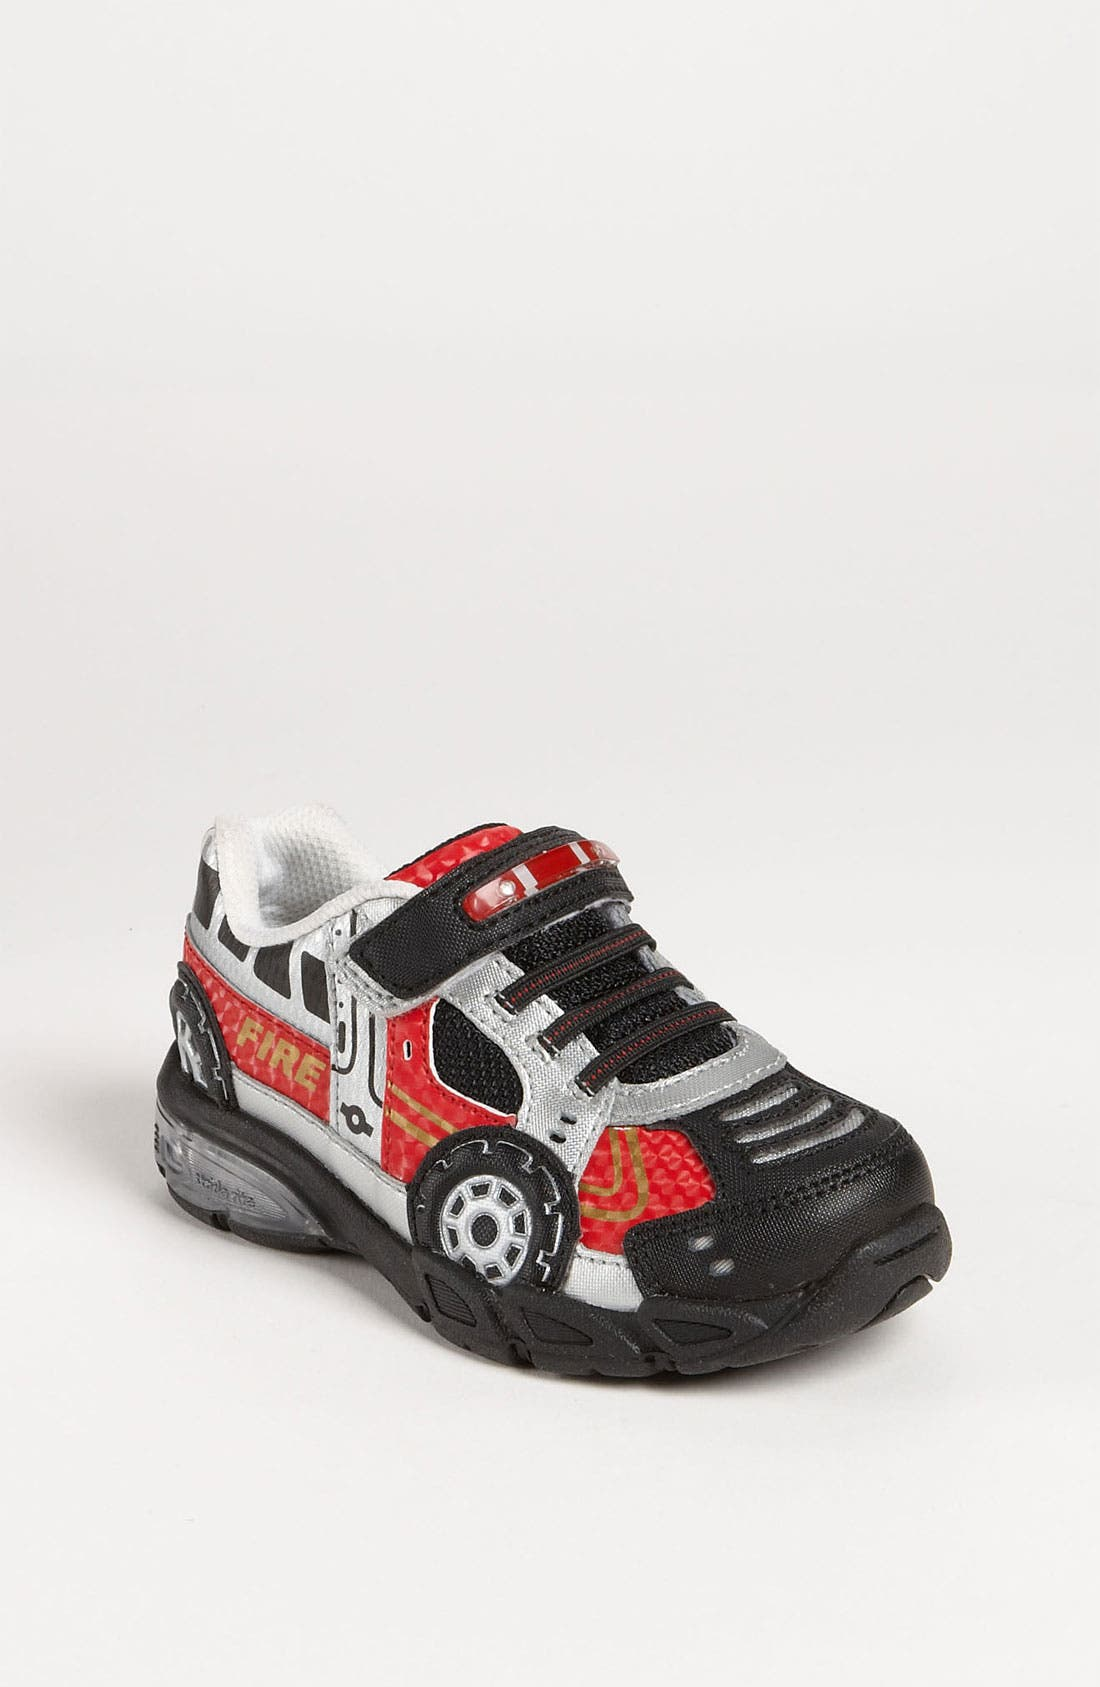 Main Image - Stride Rite 'Vroomz' Sneaker (Walker & Toddler)